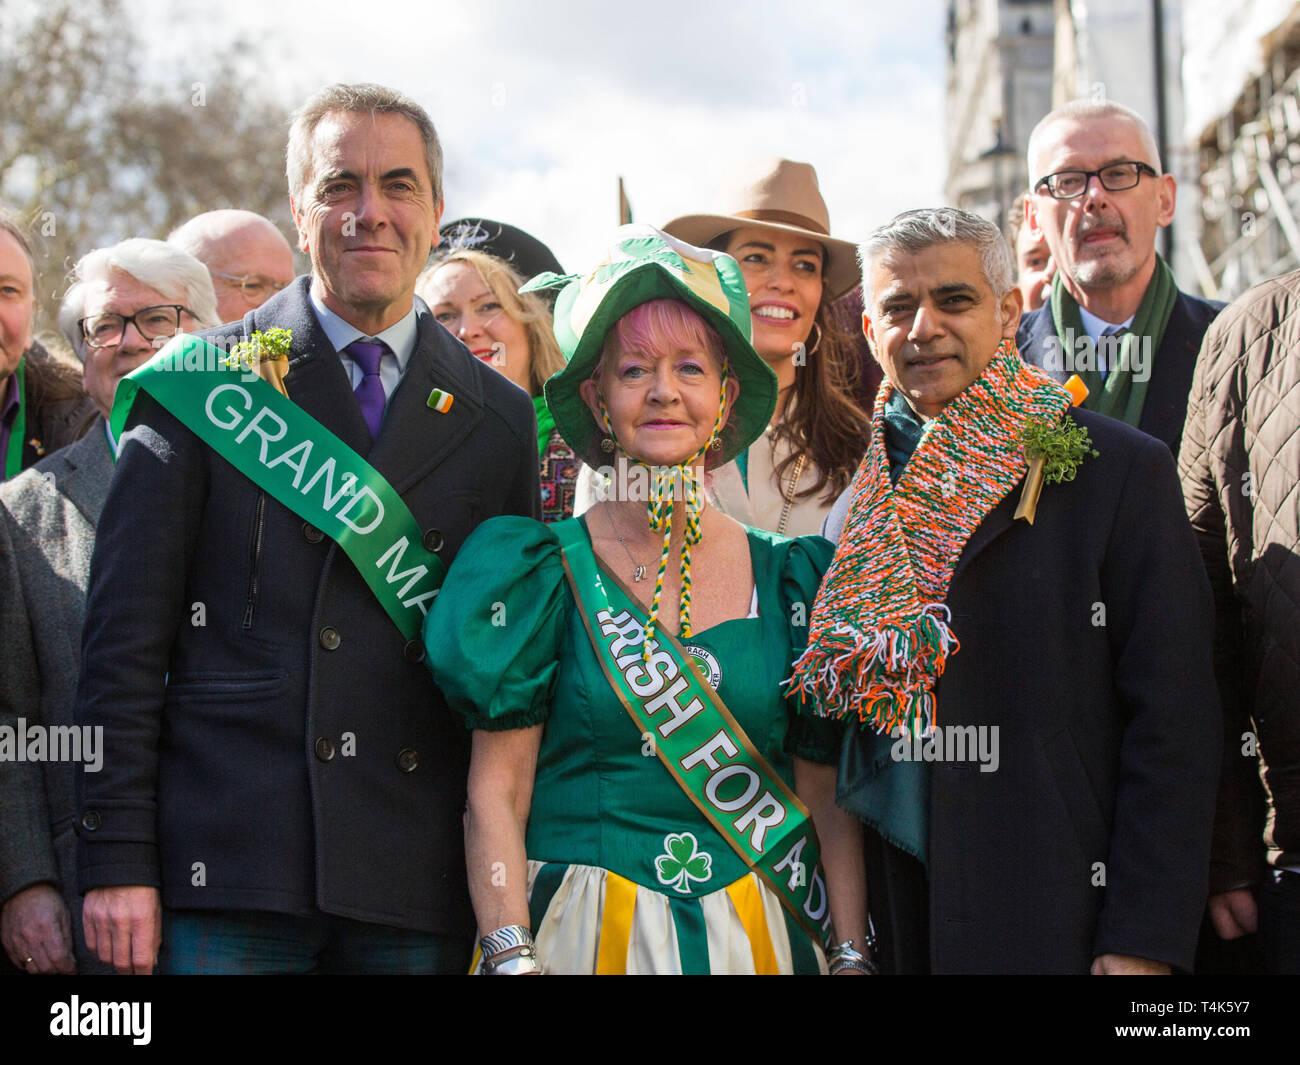 London's world-renowned St Patrick's Day parade, led by this year's Grand Marshal, actor James Nesbitt.  Featuring: James Nesbitt, Sadiq Khan Where: London, United Kingdom When: 17 Mar 2019 Credit: Wheatley/WENN - Stock Image